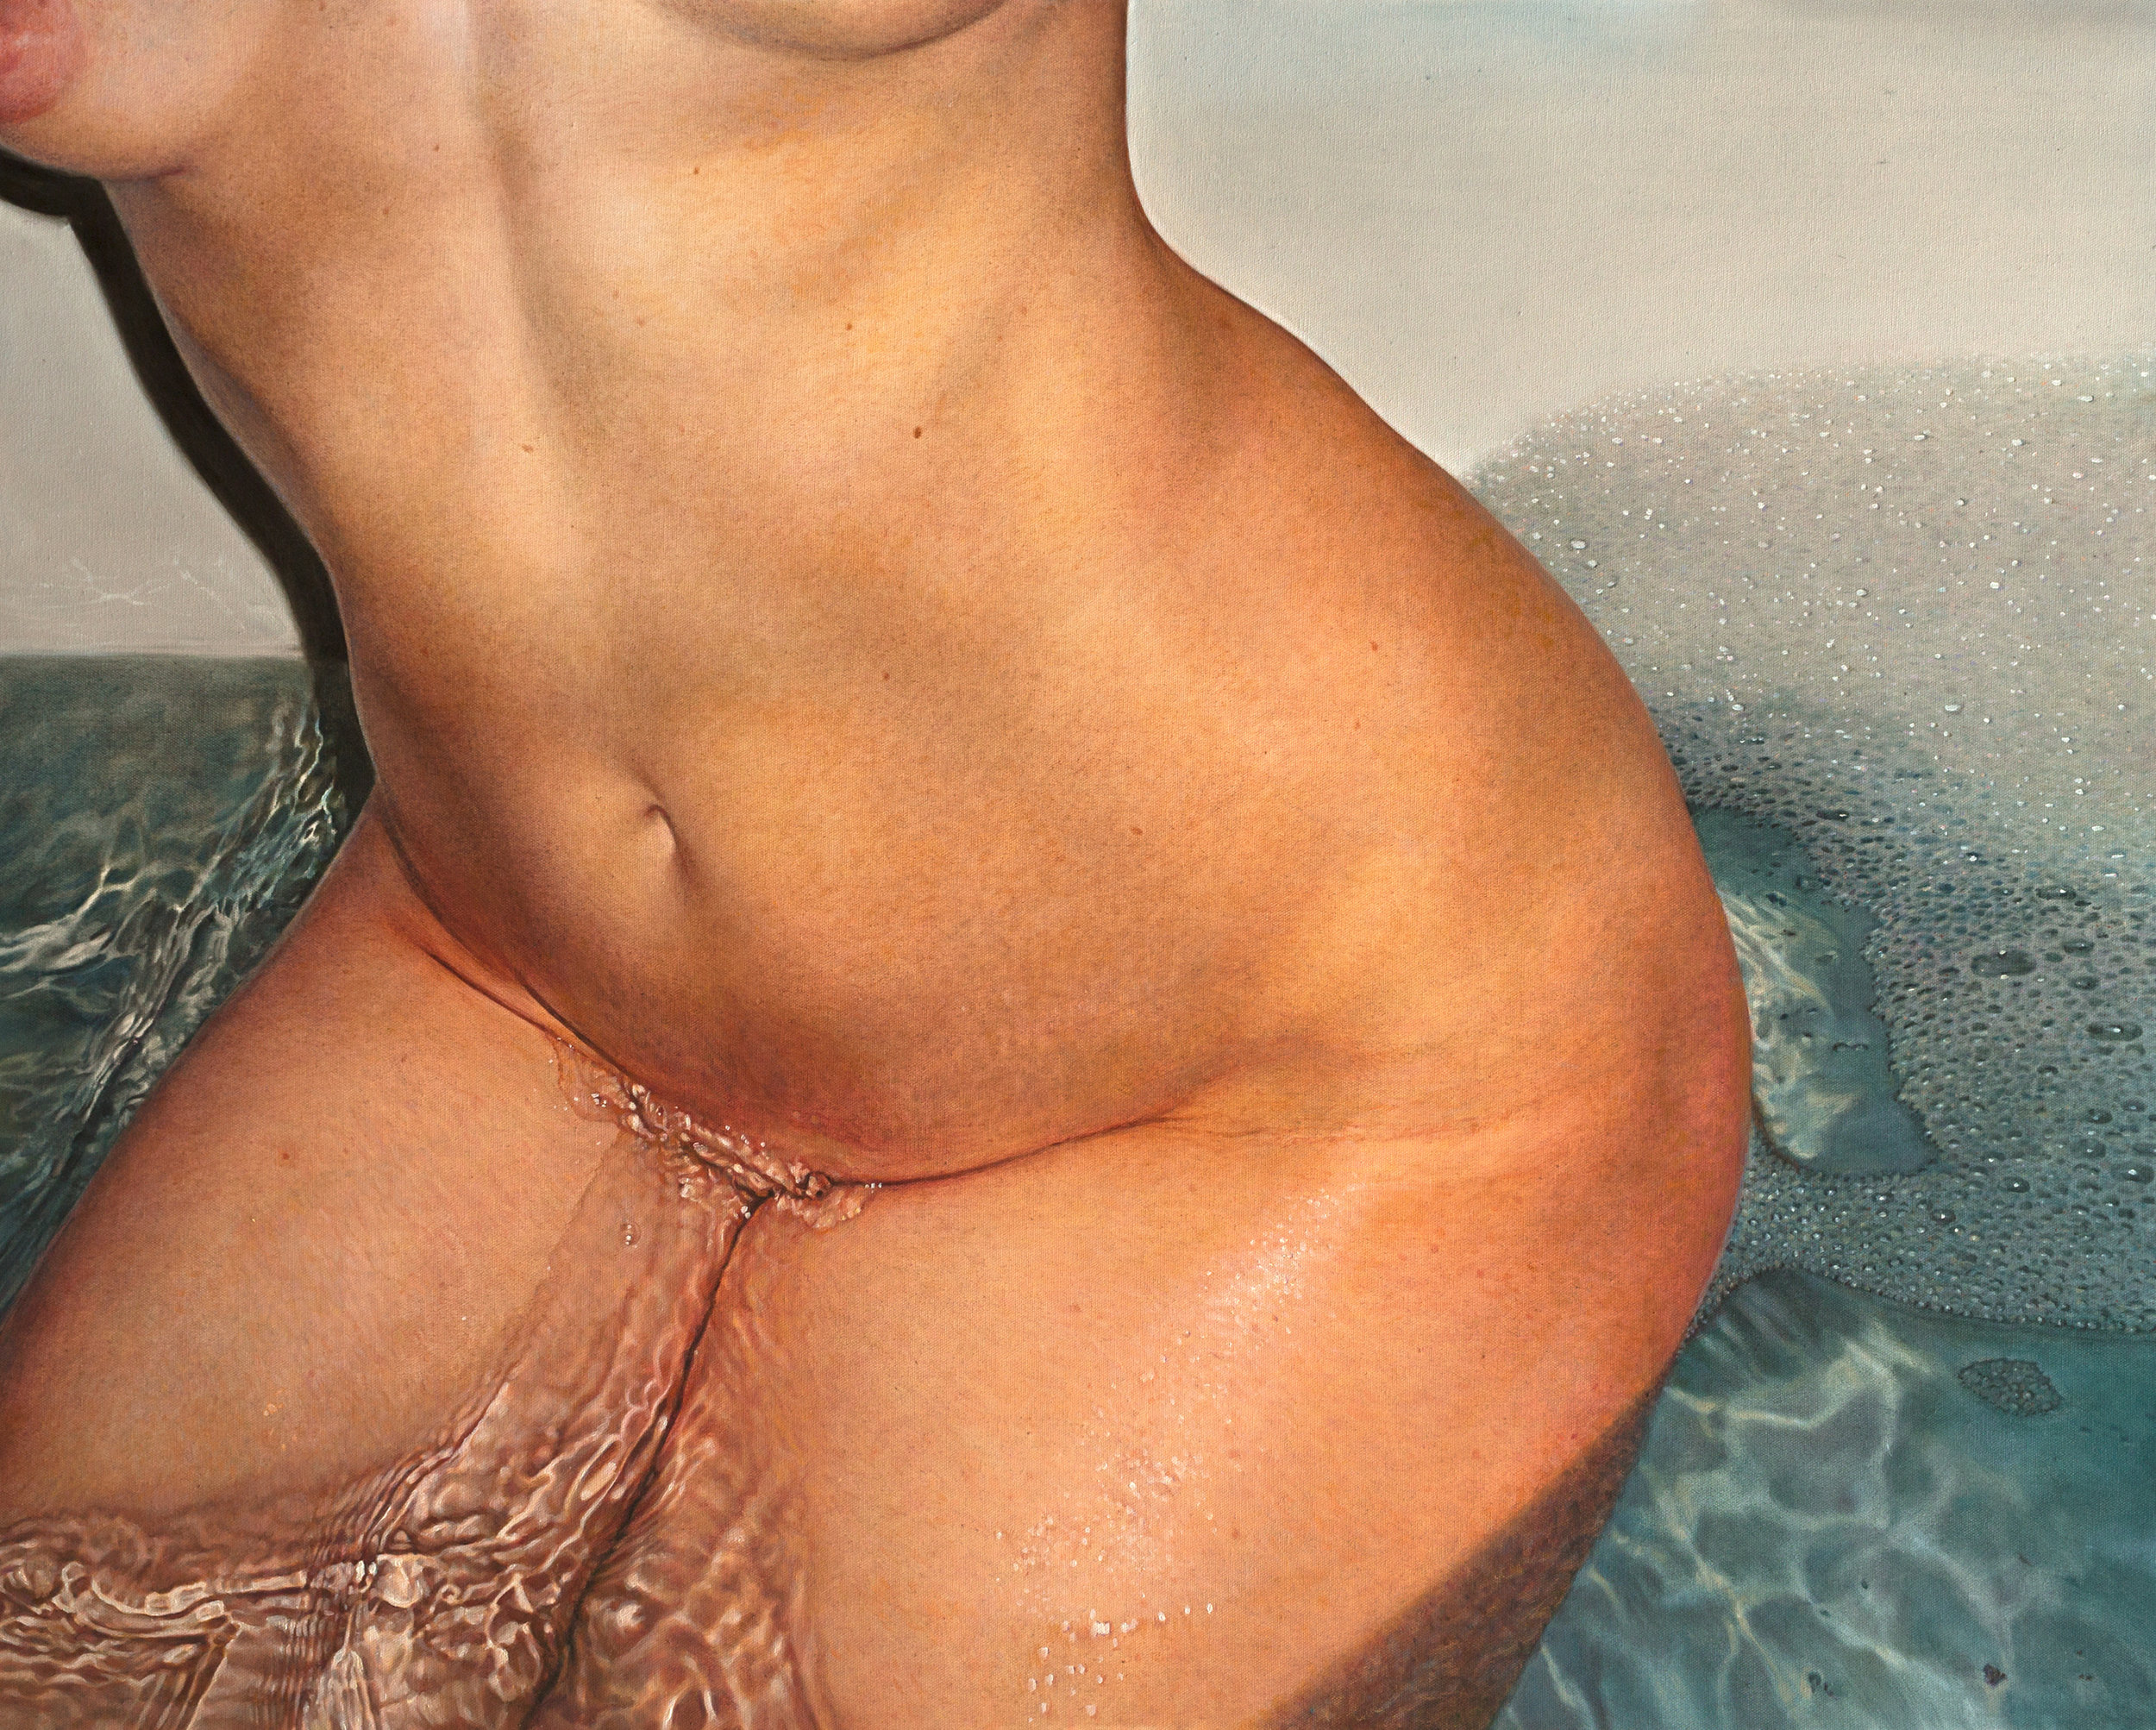 Viktoria_Savenkova_Bathing_H31,5xW47,2-inches_2014.jpg